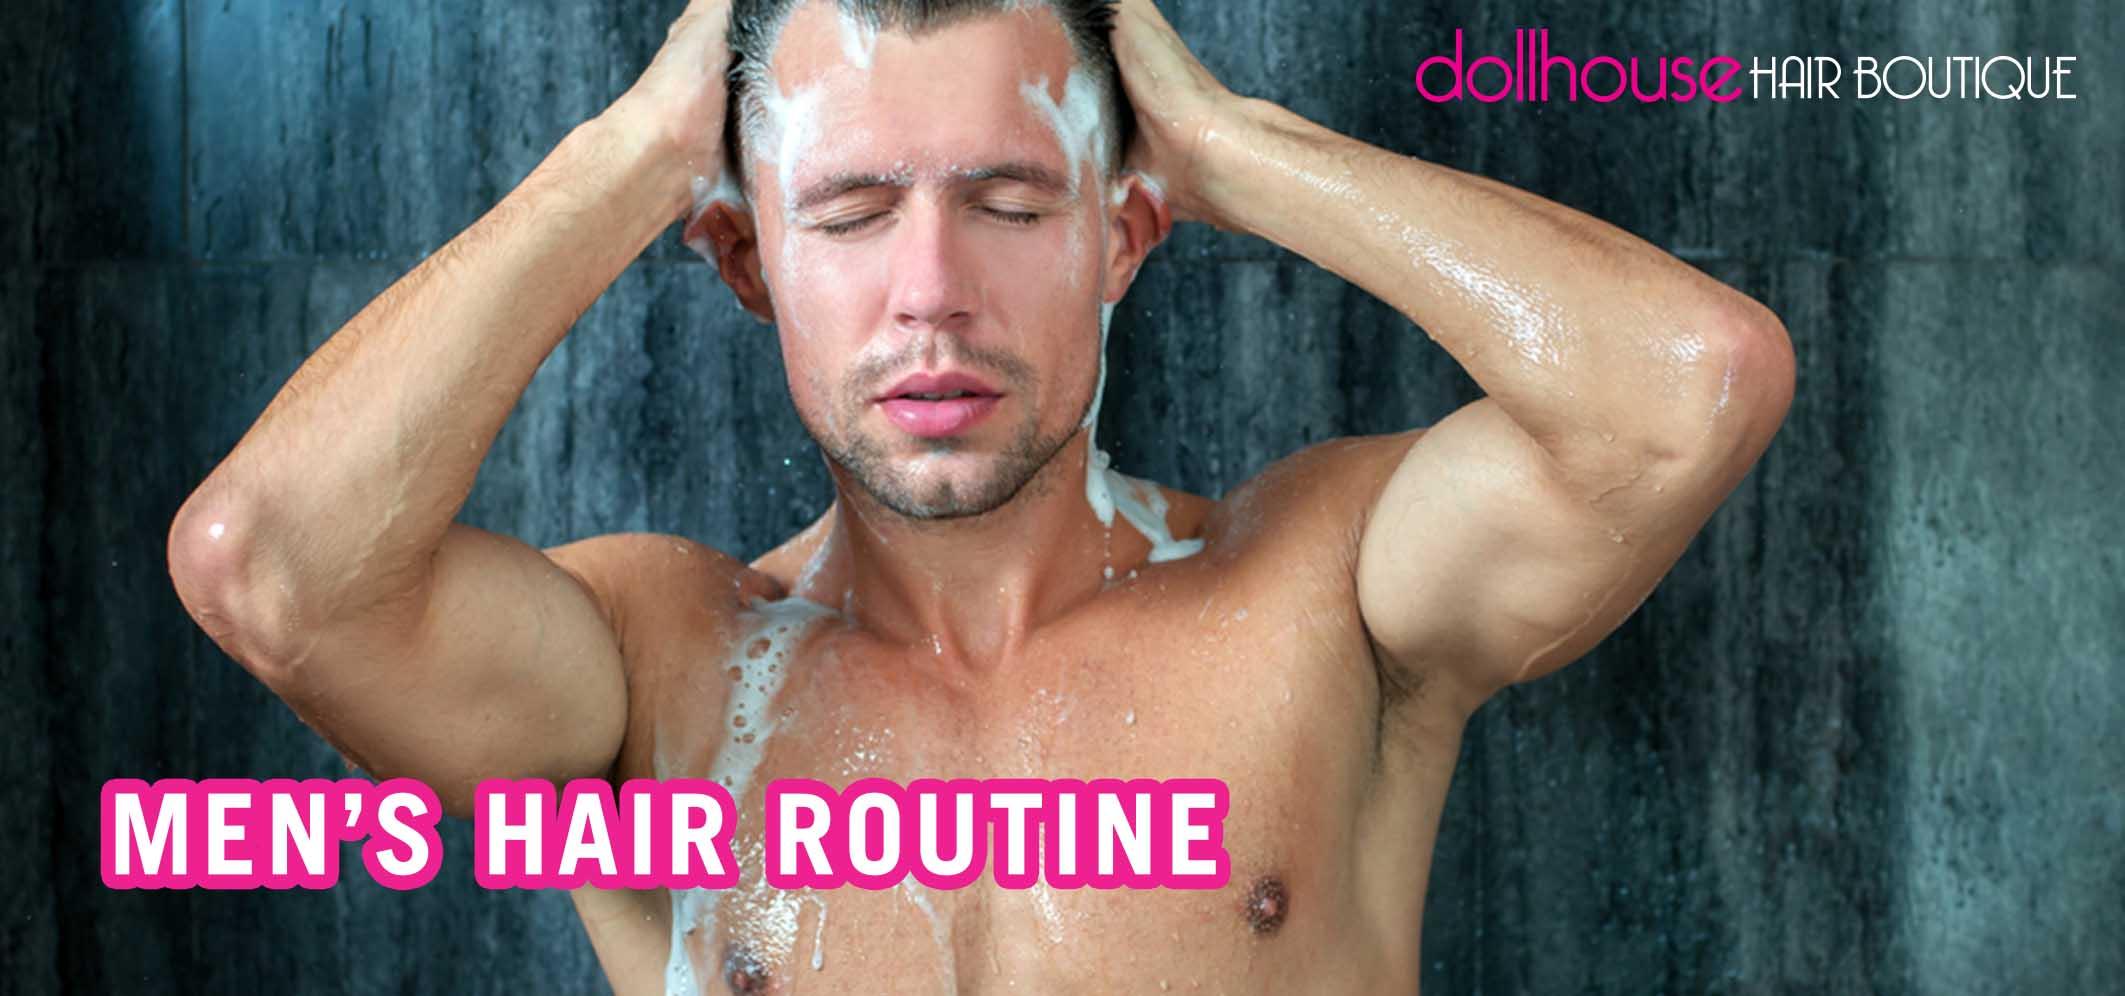 men's-hair-routine